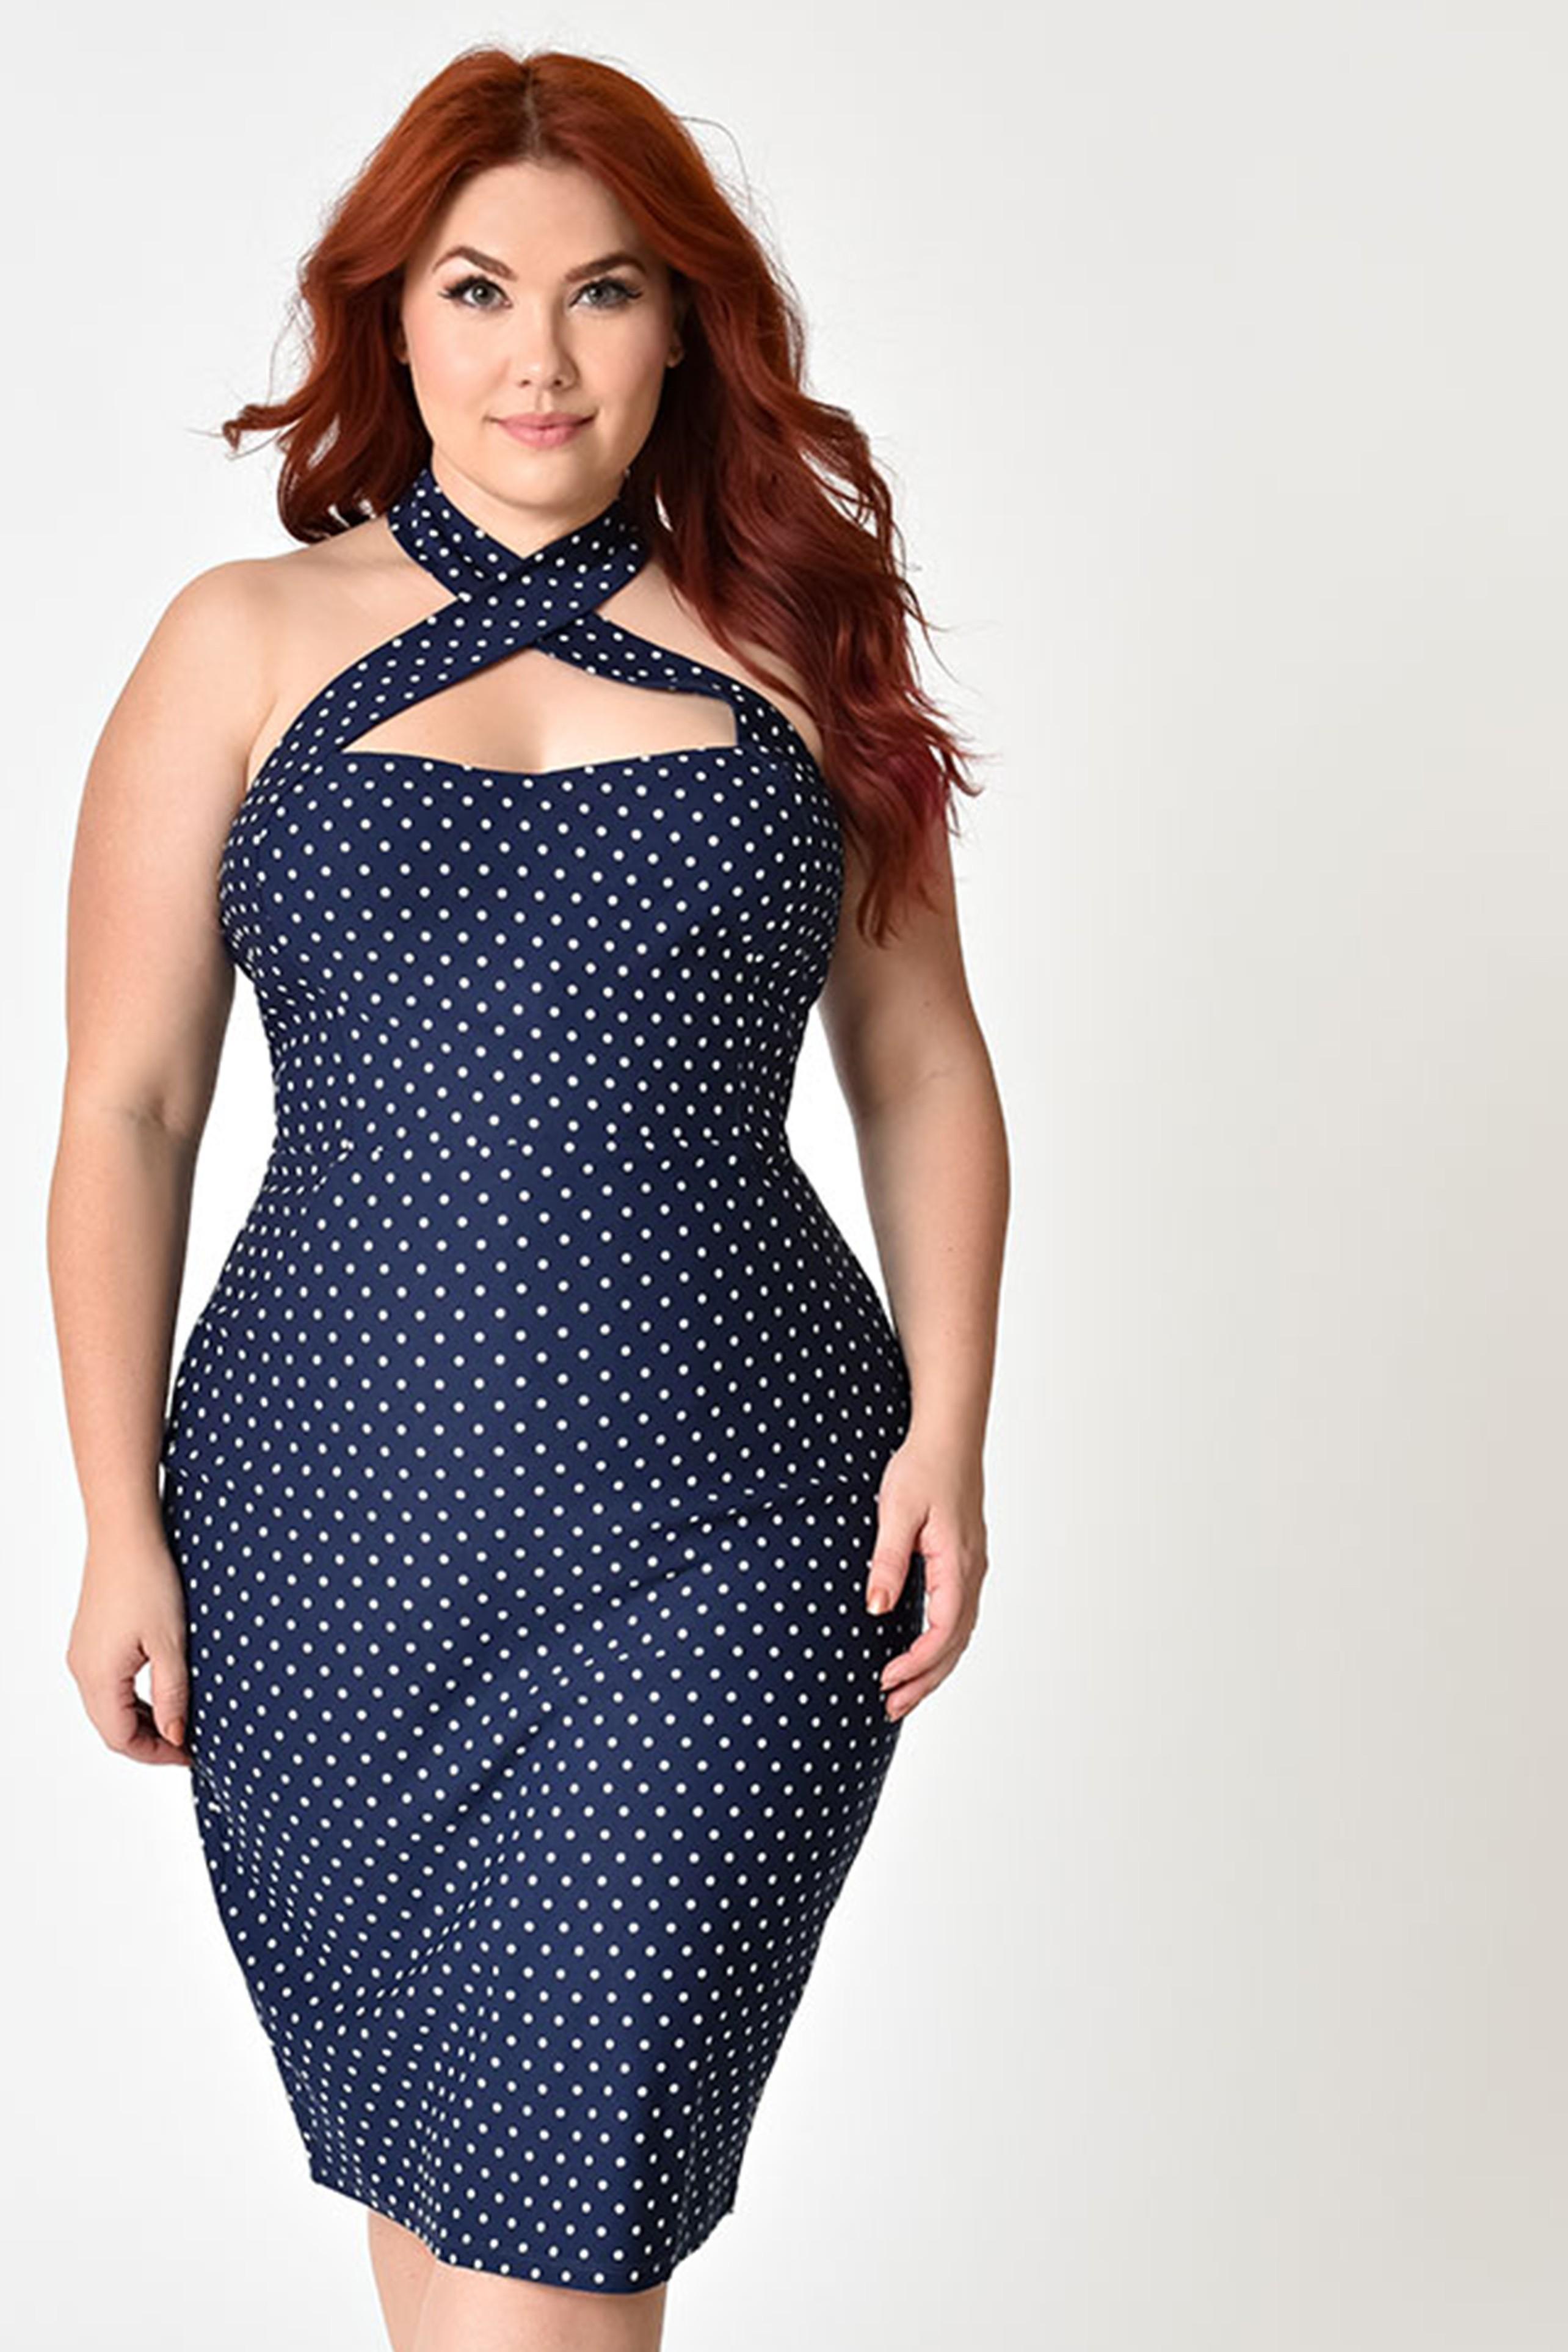 Penelope Polka Dot Plus Size Wiggle Dress by Unique Vintage ...